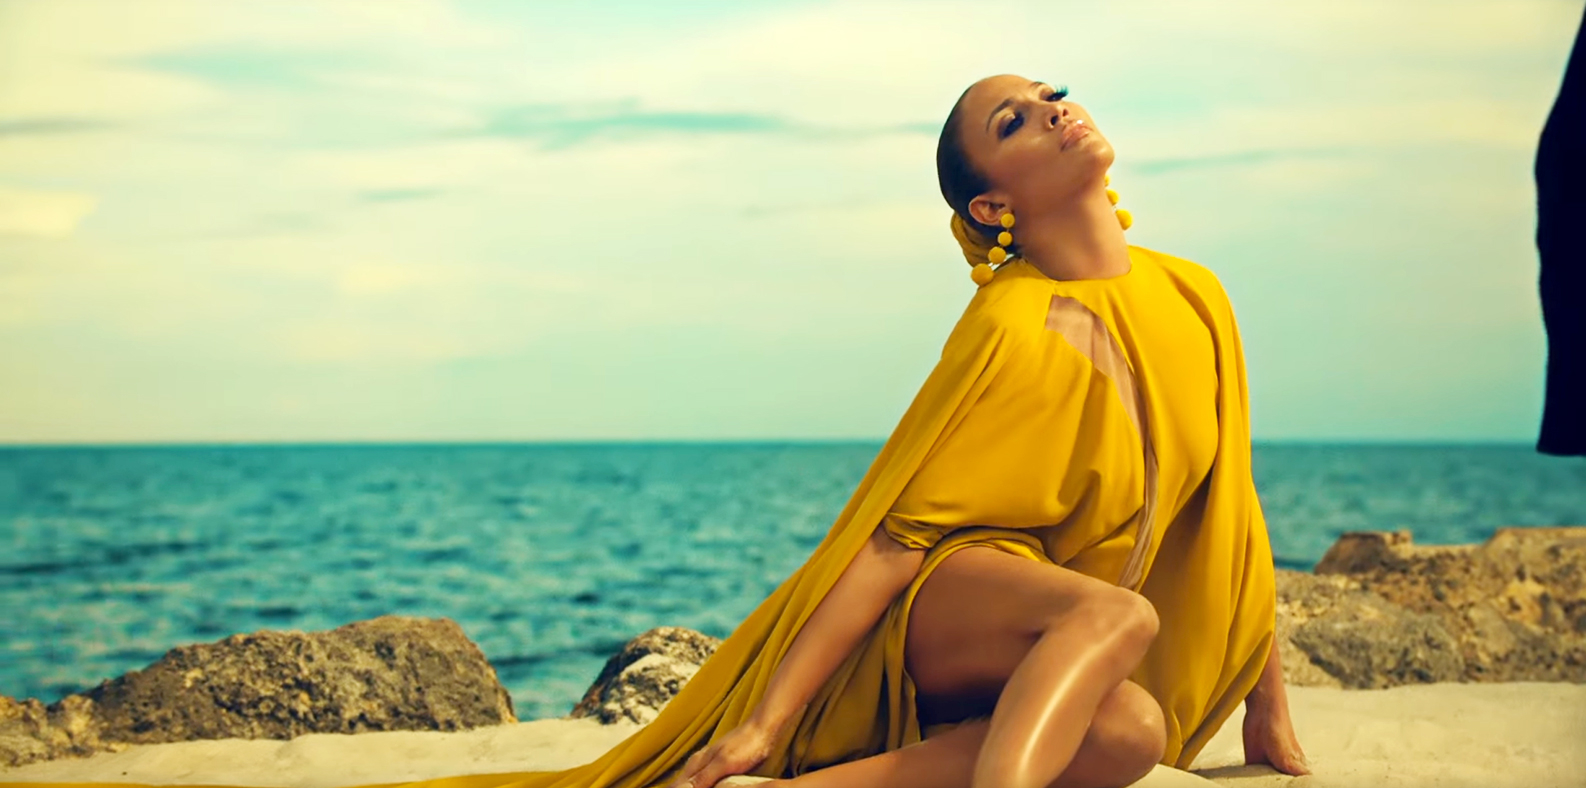 Jennifer Lopez photo 9890 of 10642 pics, wallpaper - photo